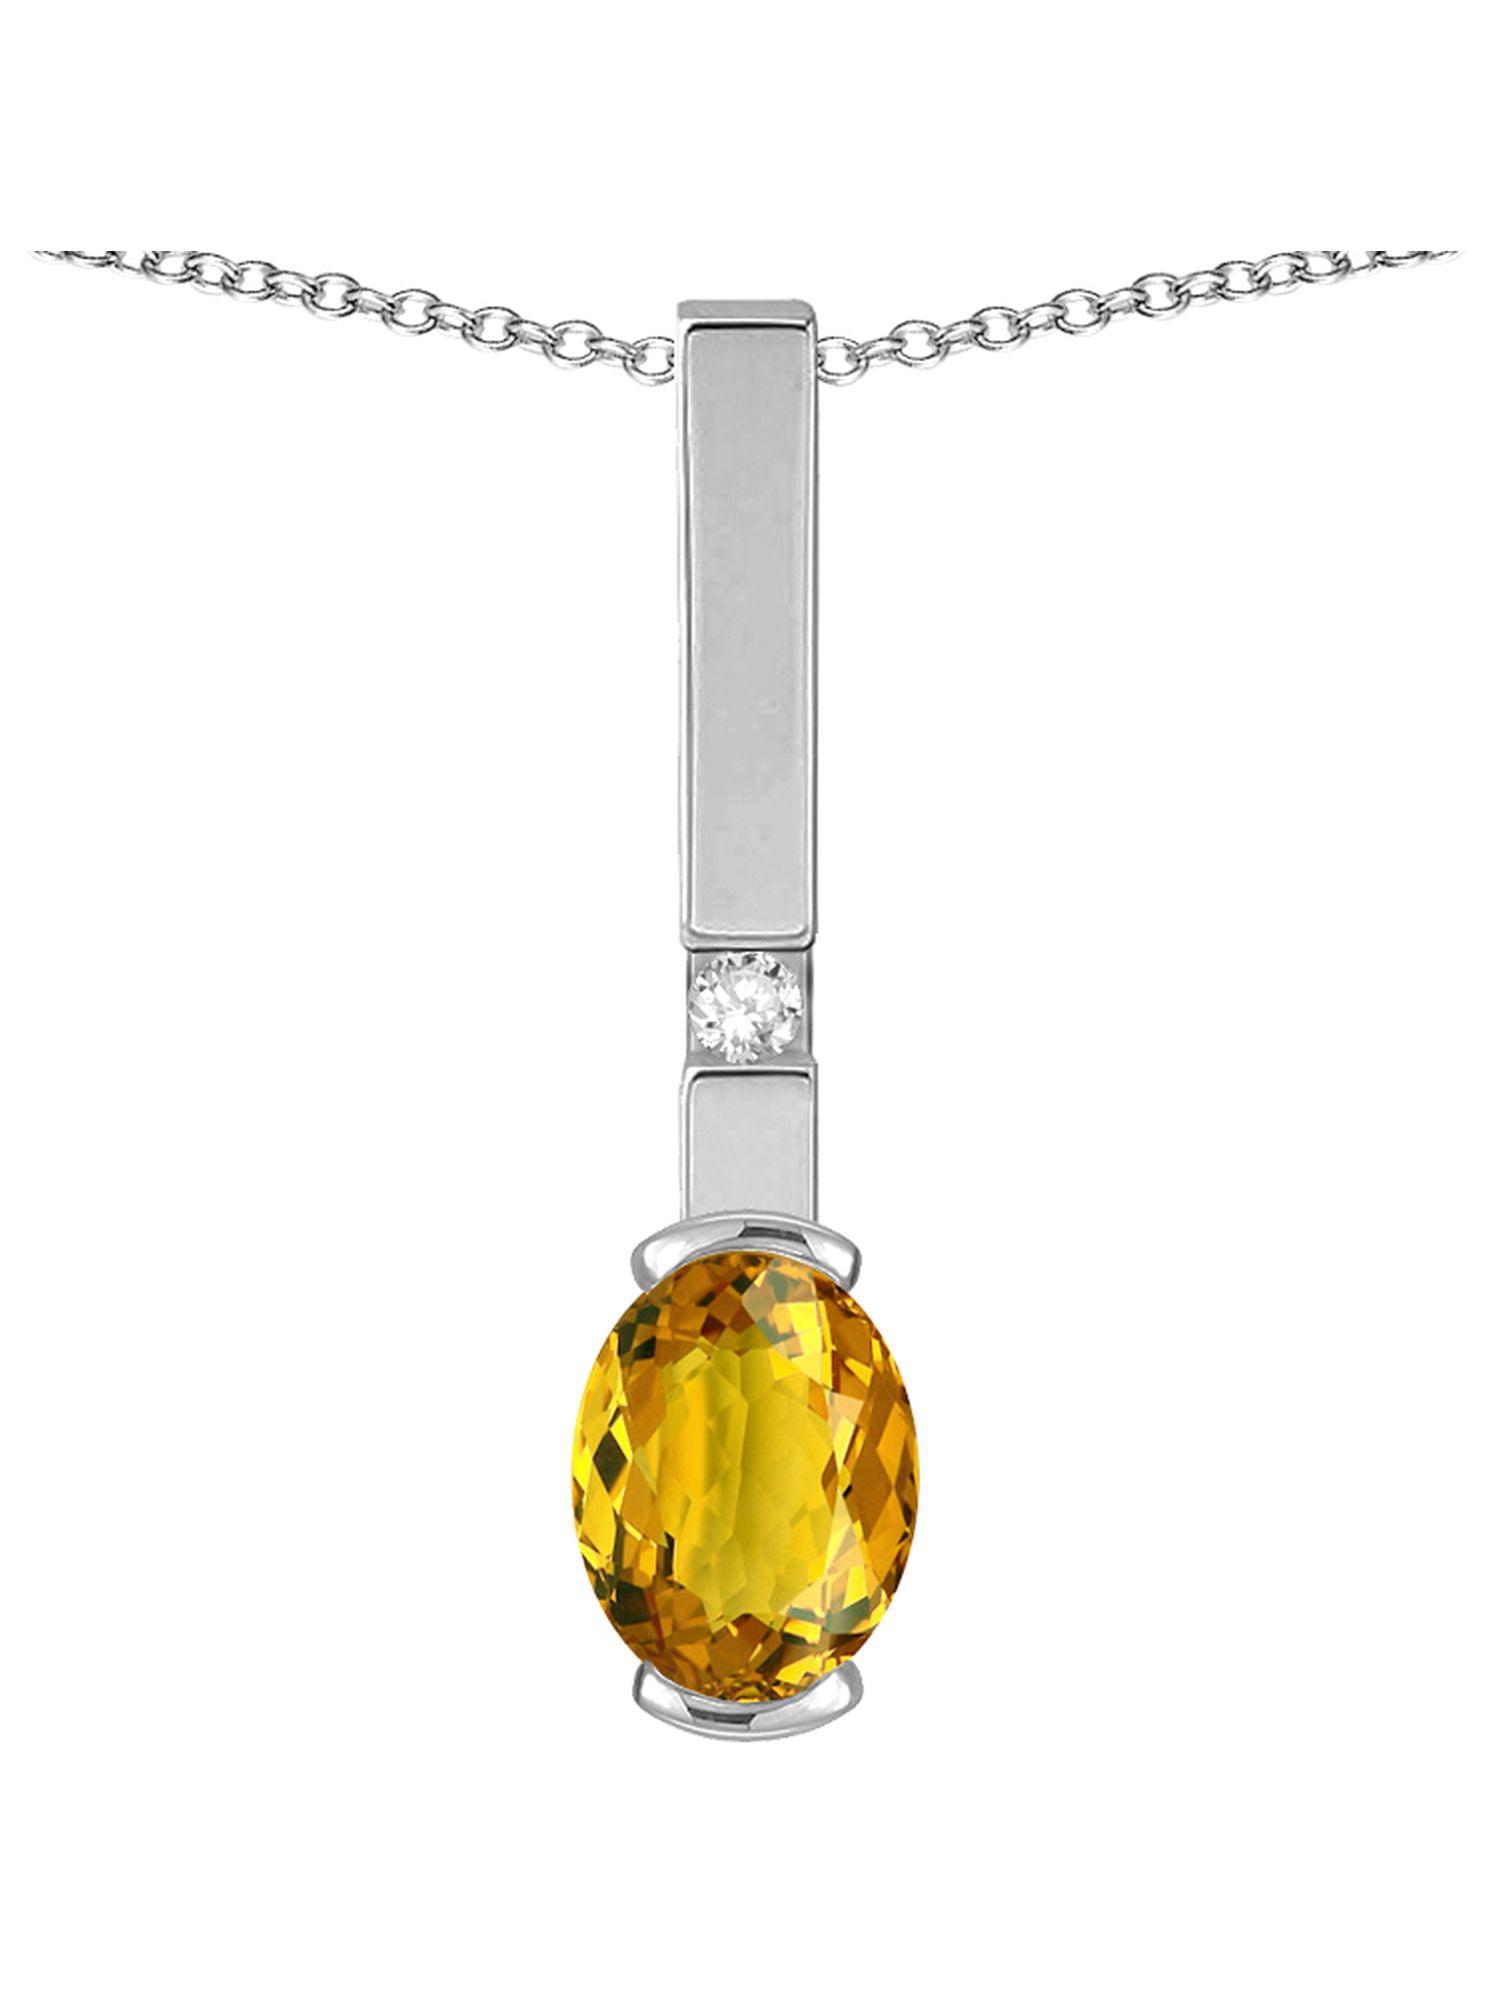 Star K Oval 8x6mm Genuine Citrine Bar Pendant Necklace by Star K